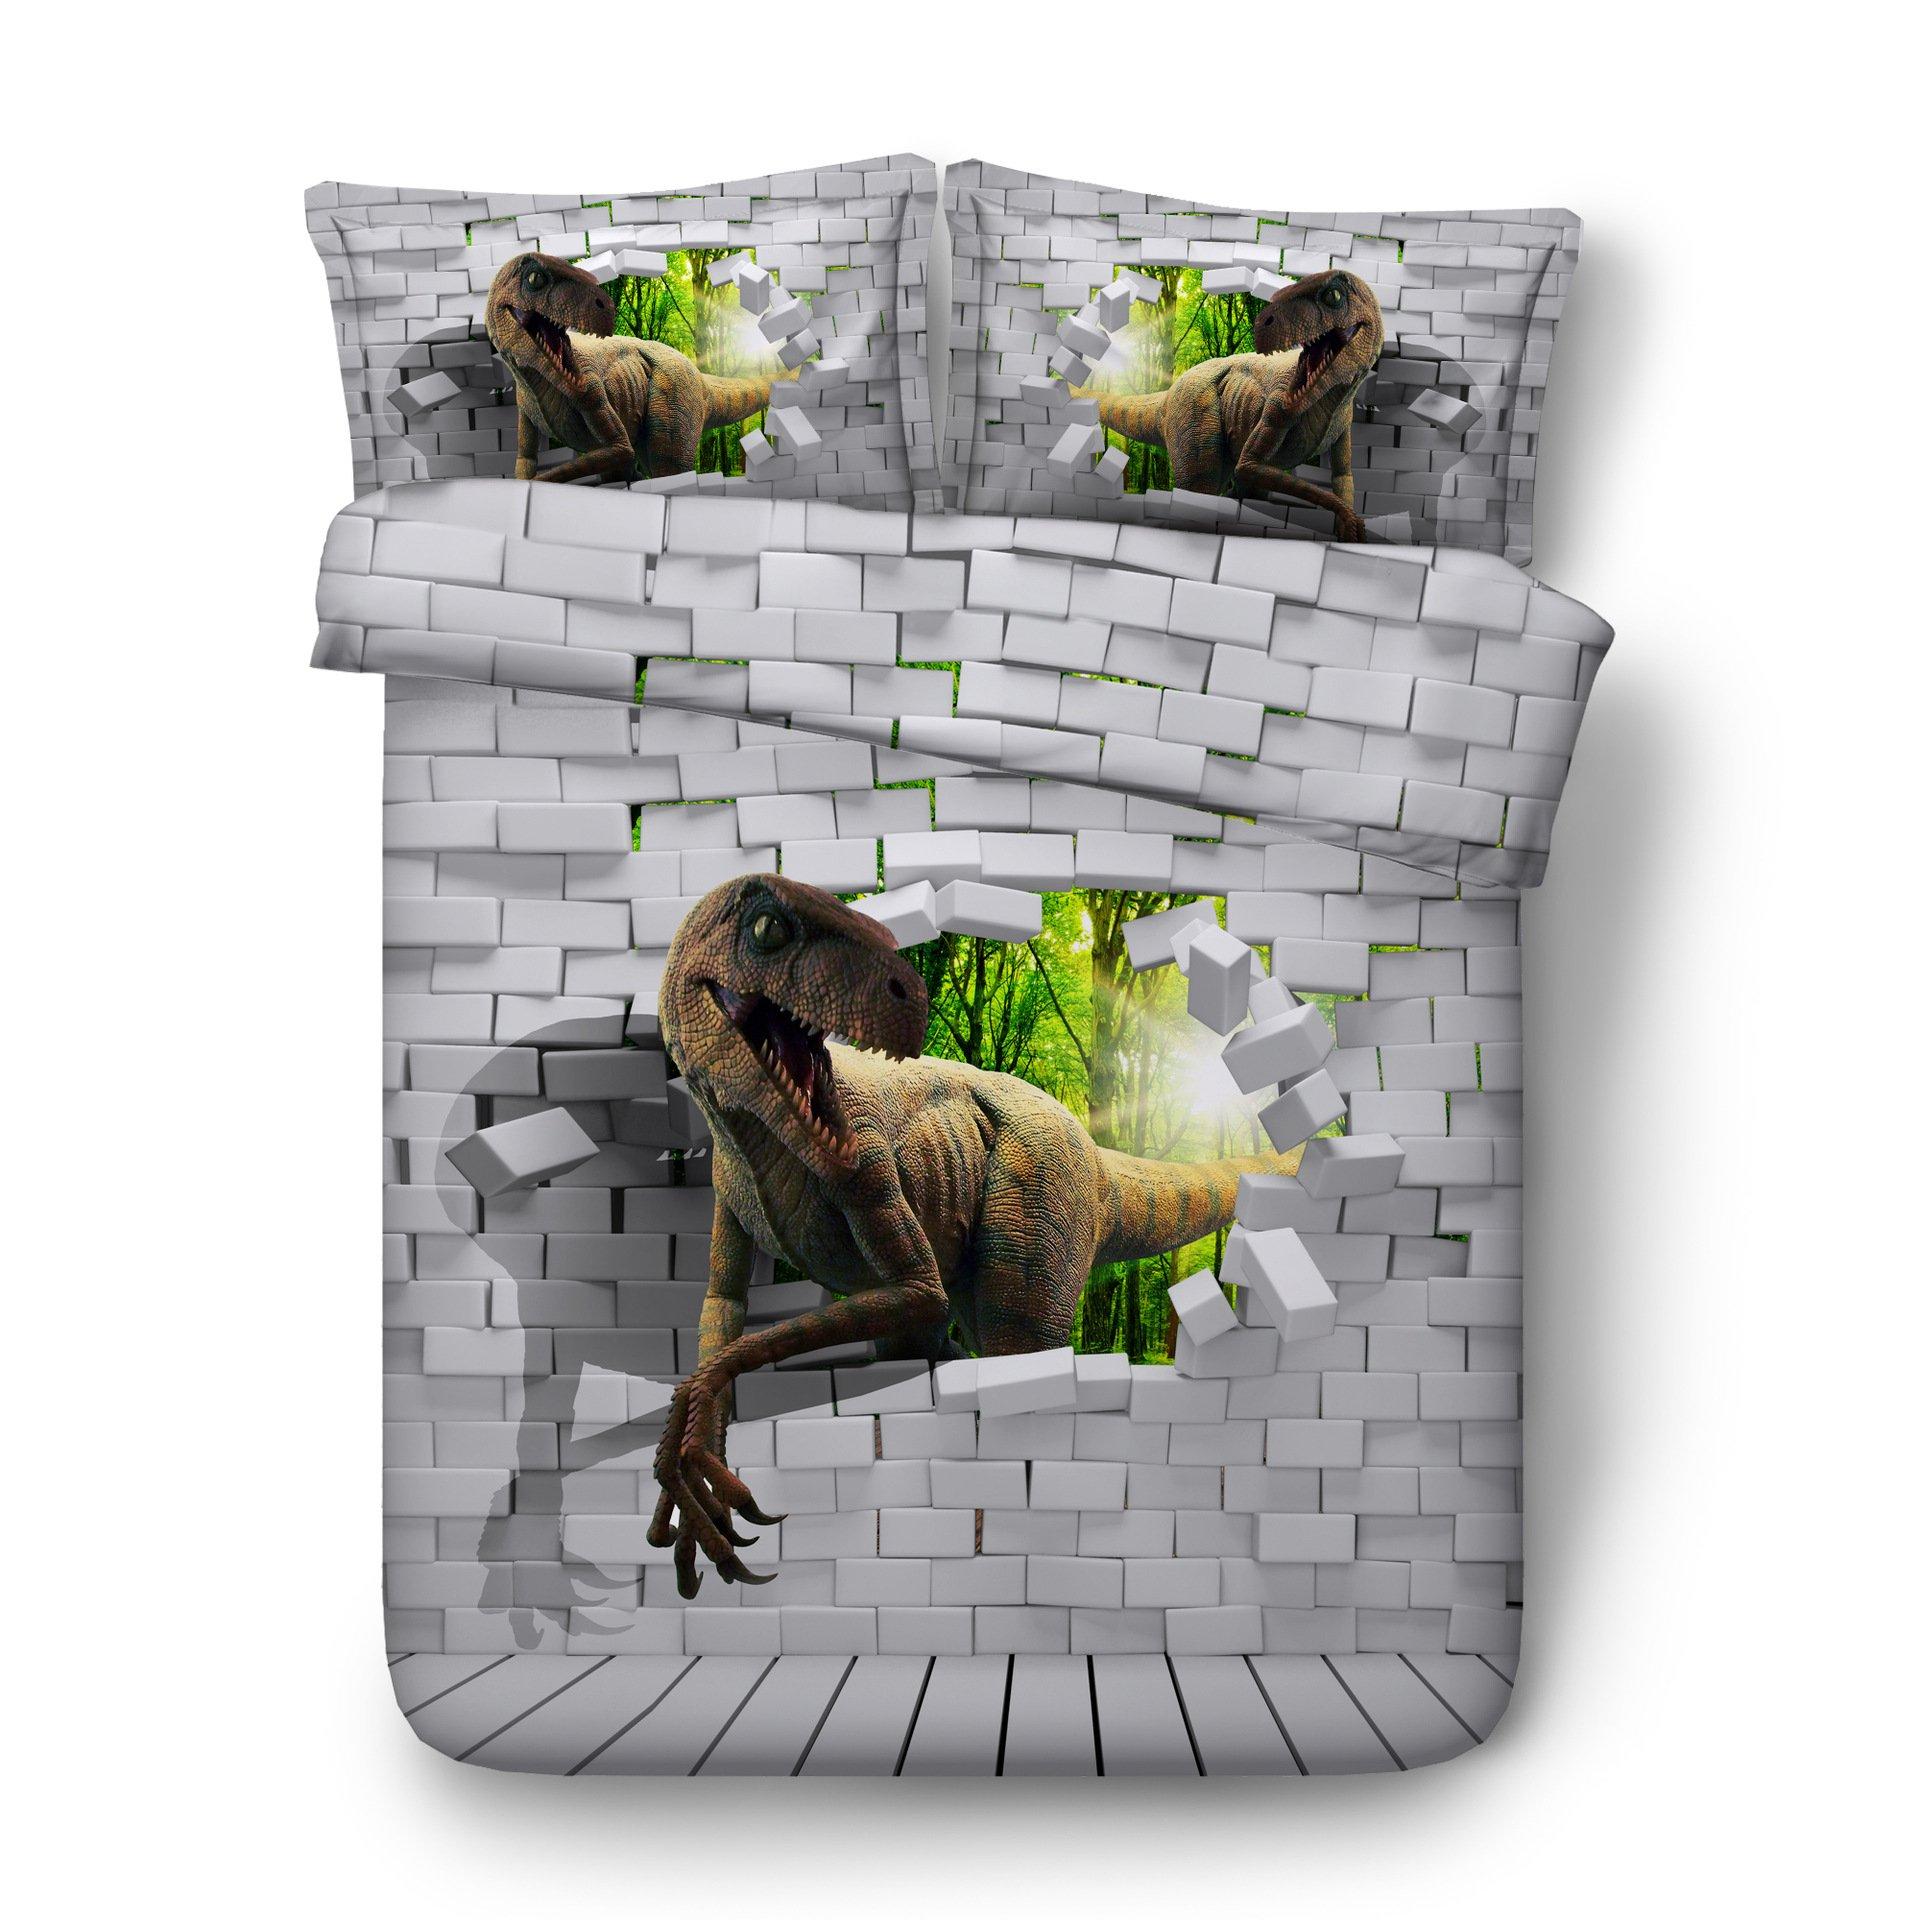 EsyDream Jurassic Period 3D Oil Dinosaur Men's Bedding Quilt Cover Twin King Queen Size Jurassic World Dinosaur Boys Bedding Duvet Bedlinen 3pc/Set No Quilt(Queen,Color 12)